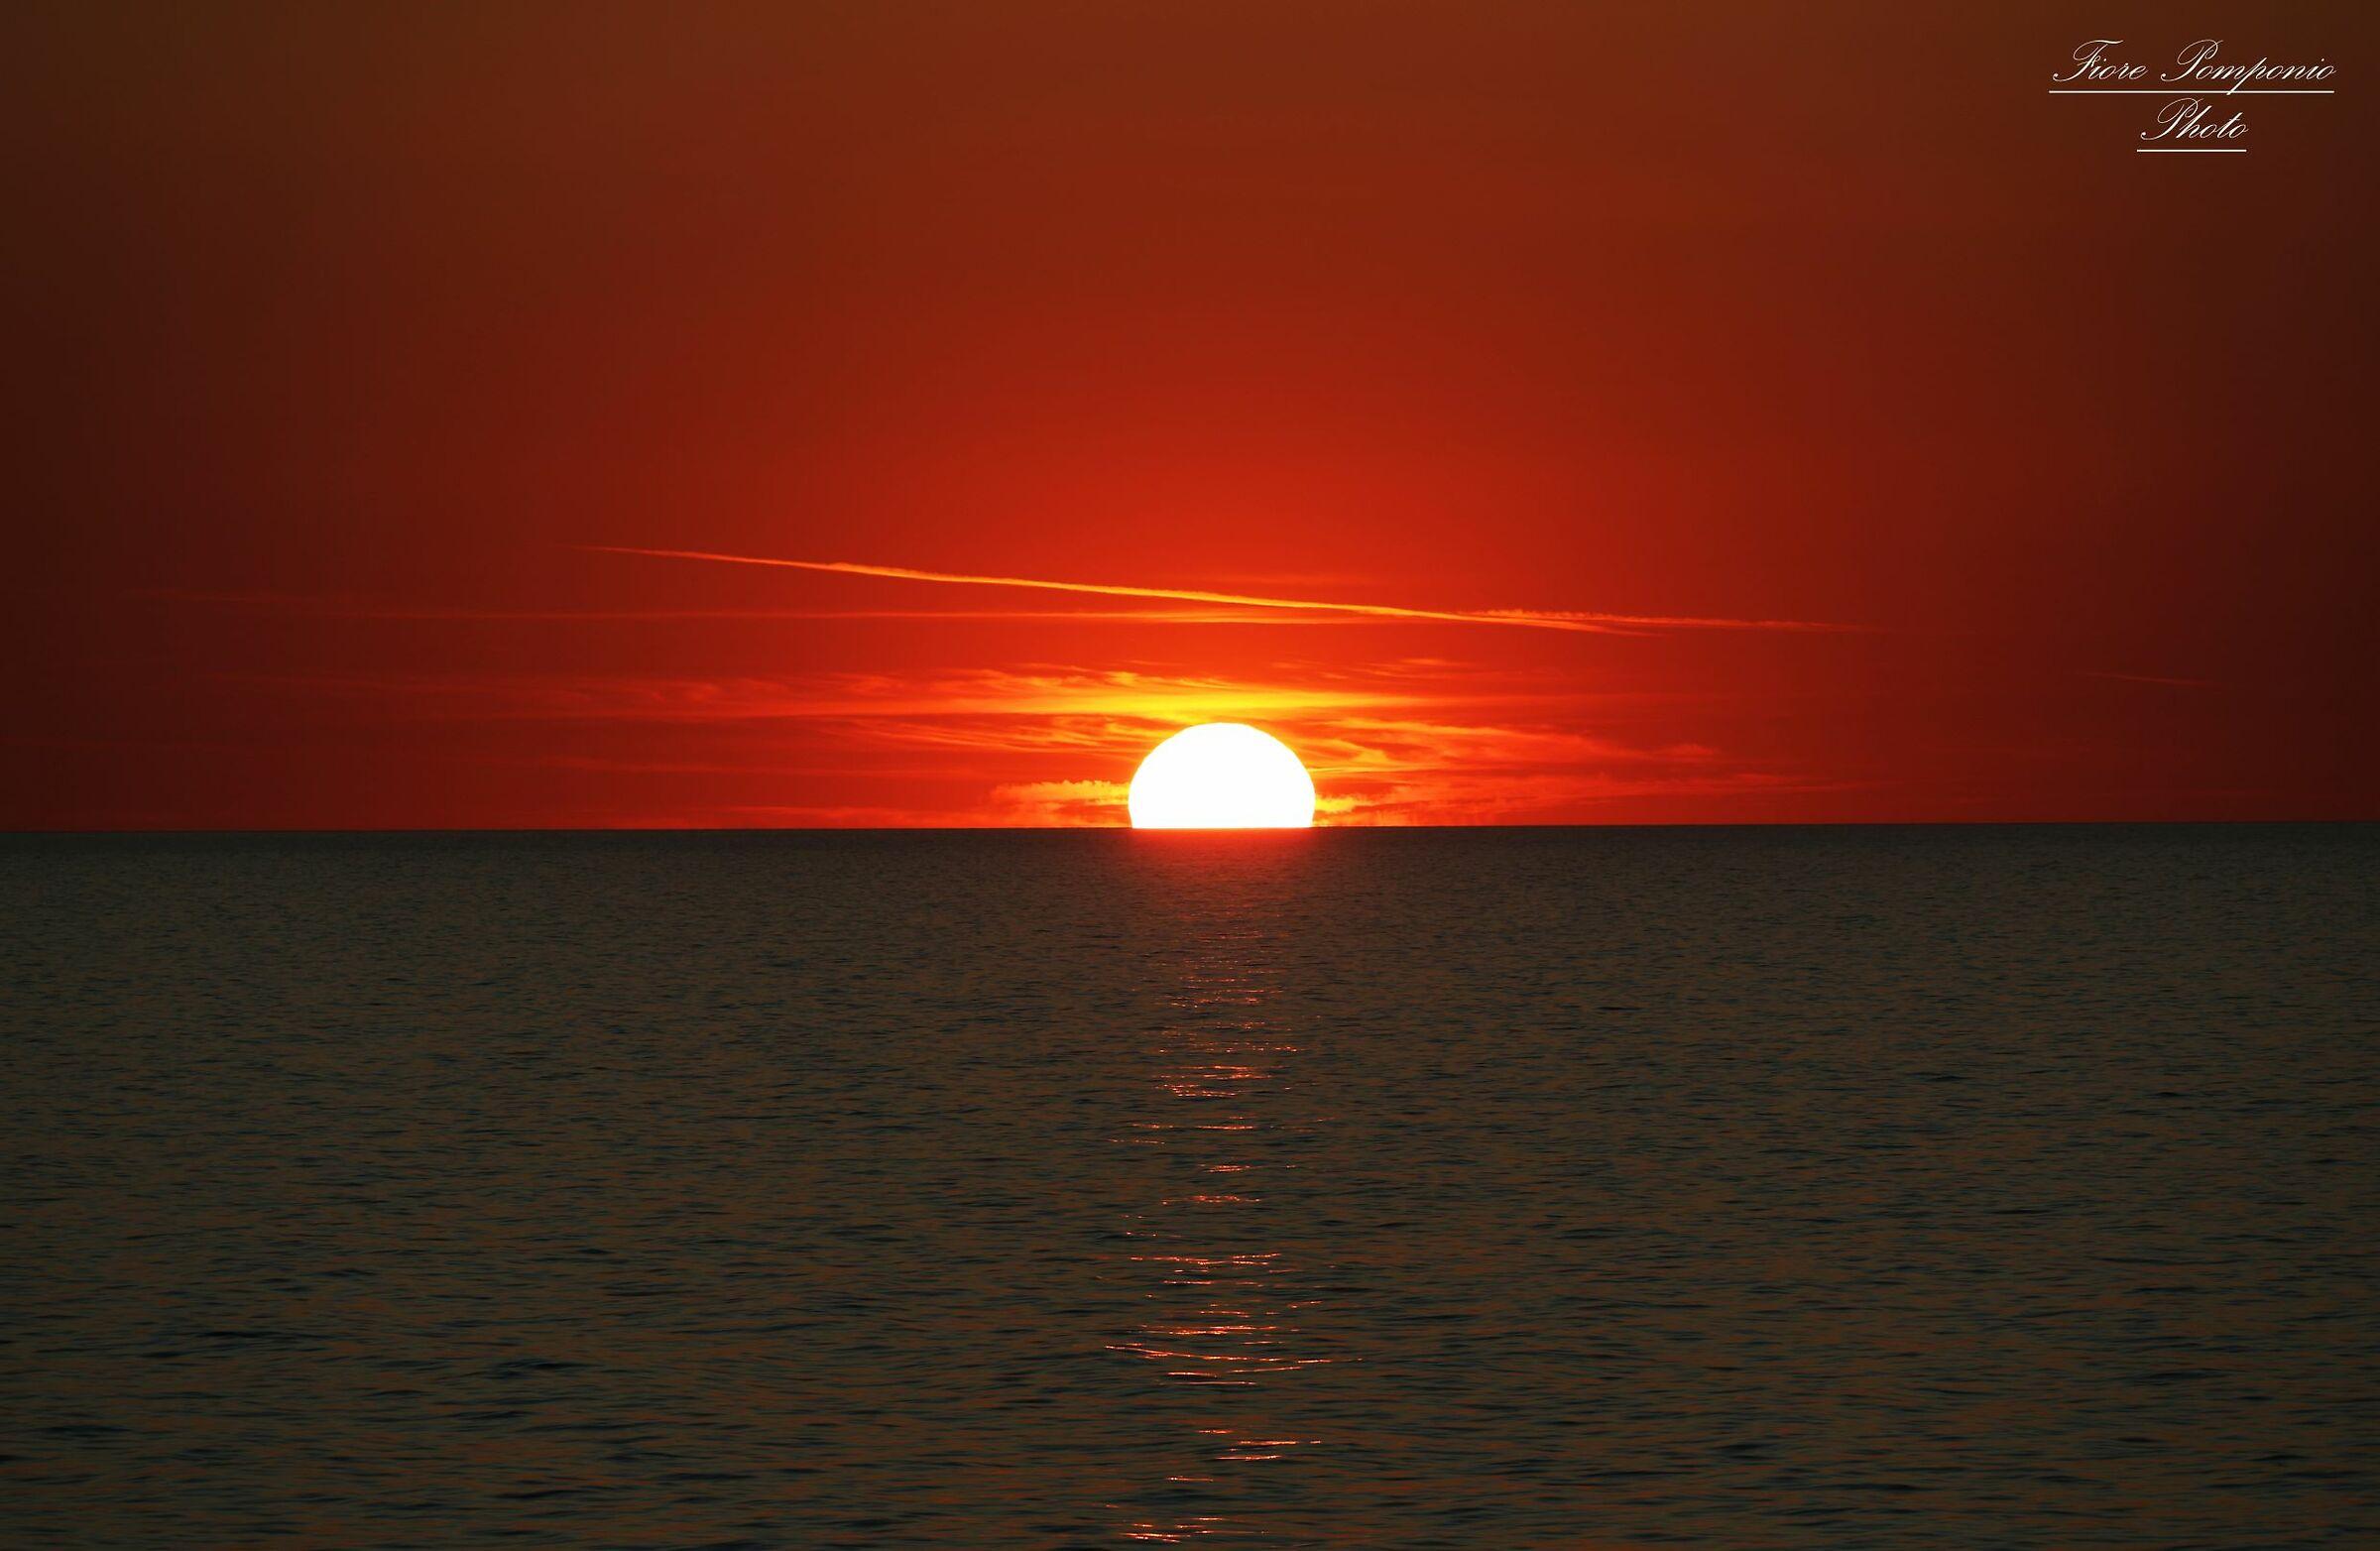 Sunrise over the Adriatic Sea...